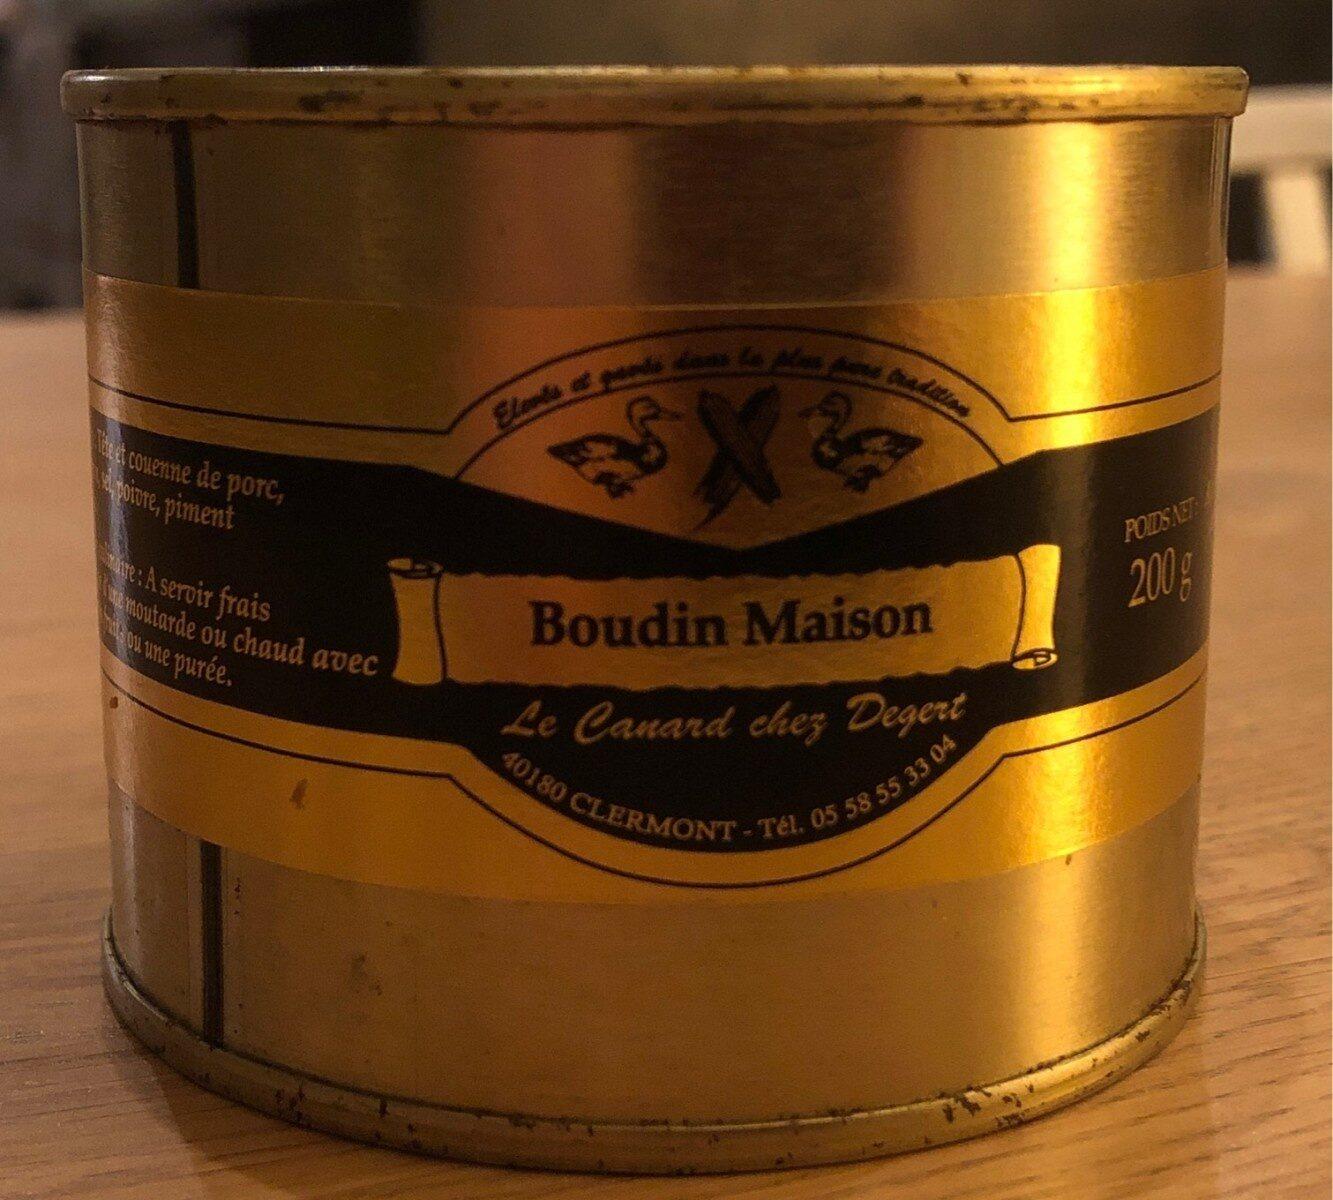 Boudin maison - Product - fr